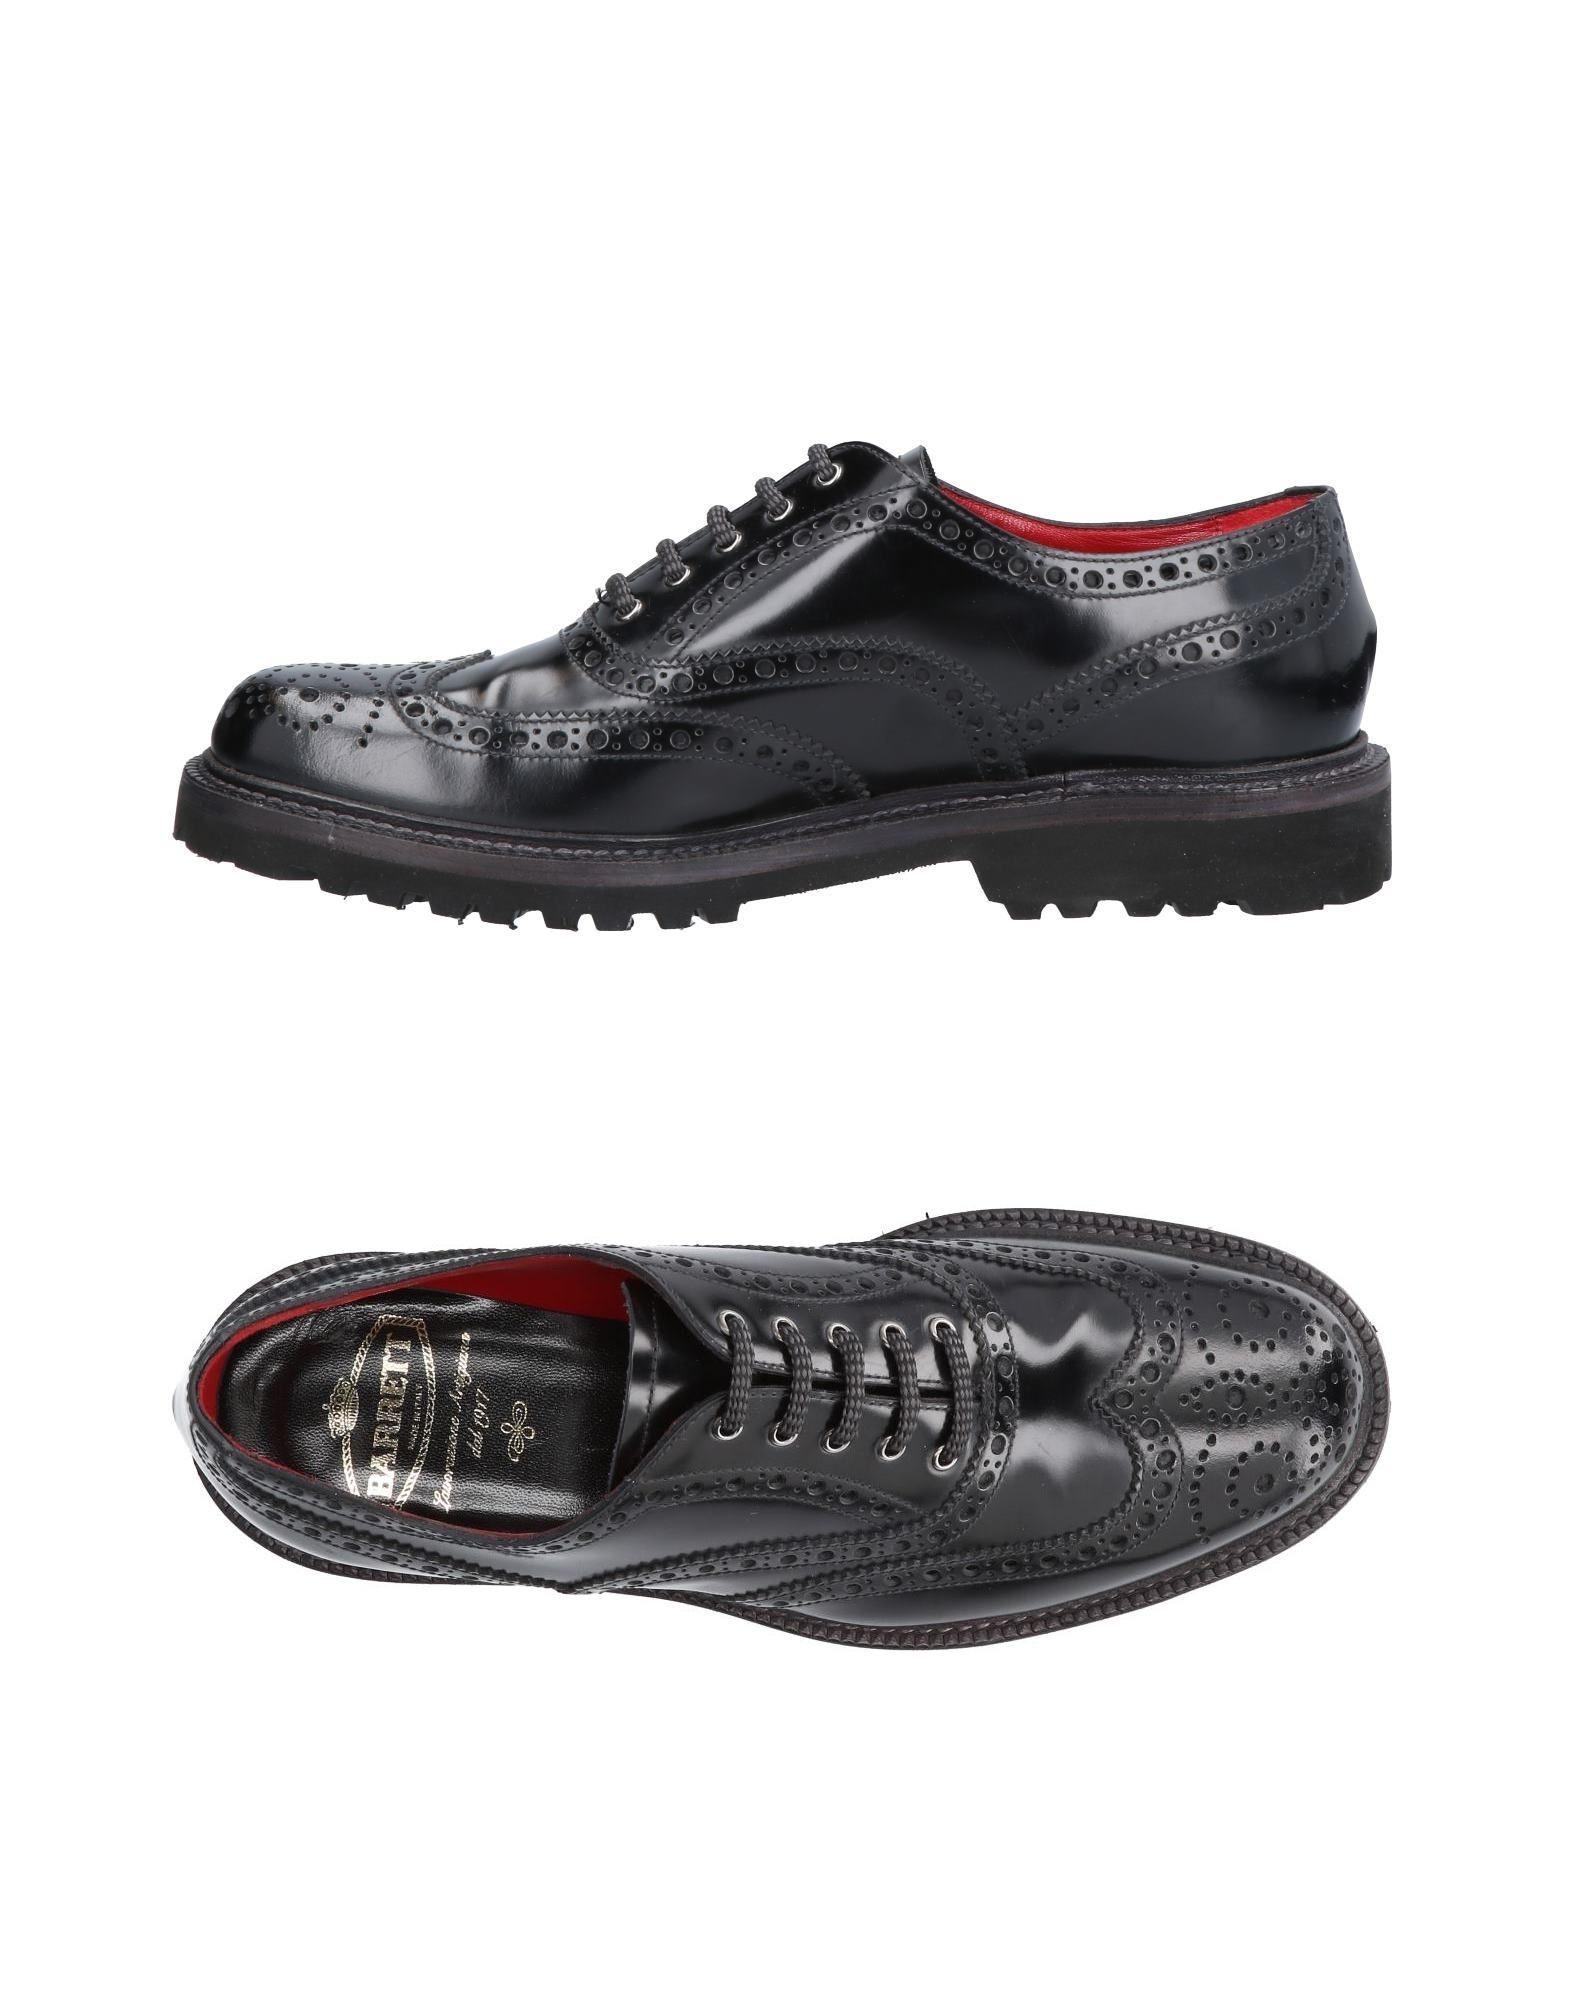 Barrett Schnürschuhe Herren  11456191PN Gute Qualität beliebte Schuhe